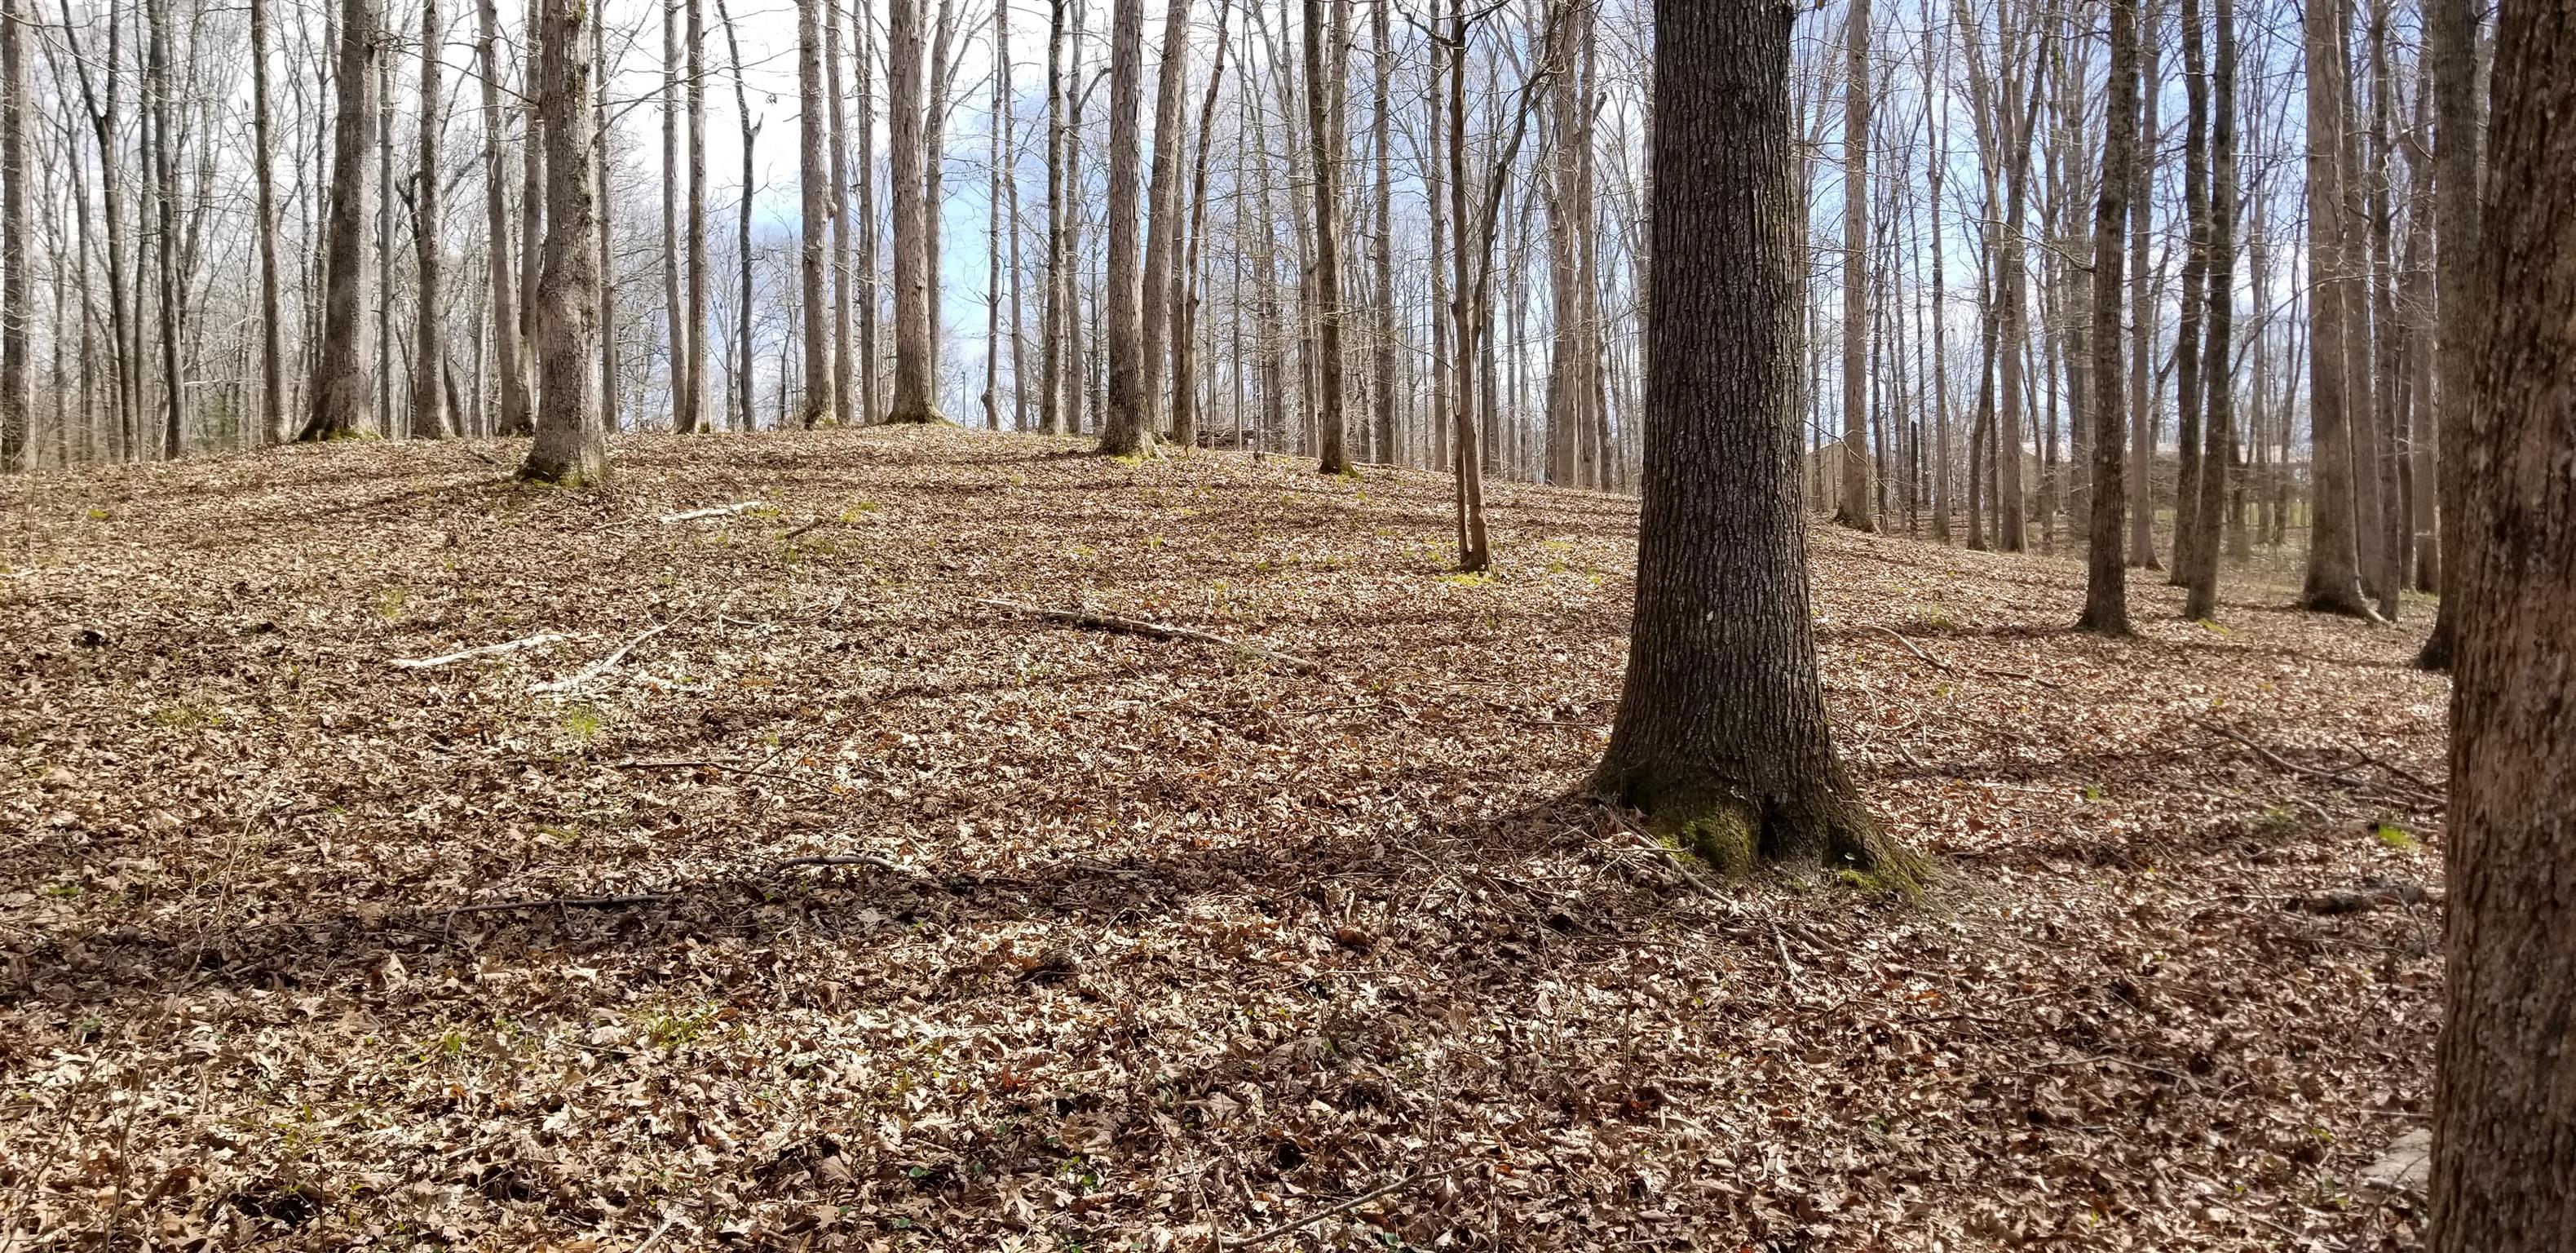 0 Driftwood Dr, Lobelville, TN 37097 - Lobelville, TN real estate listing